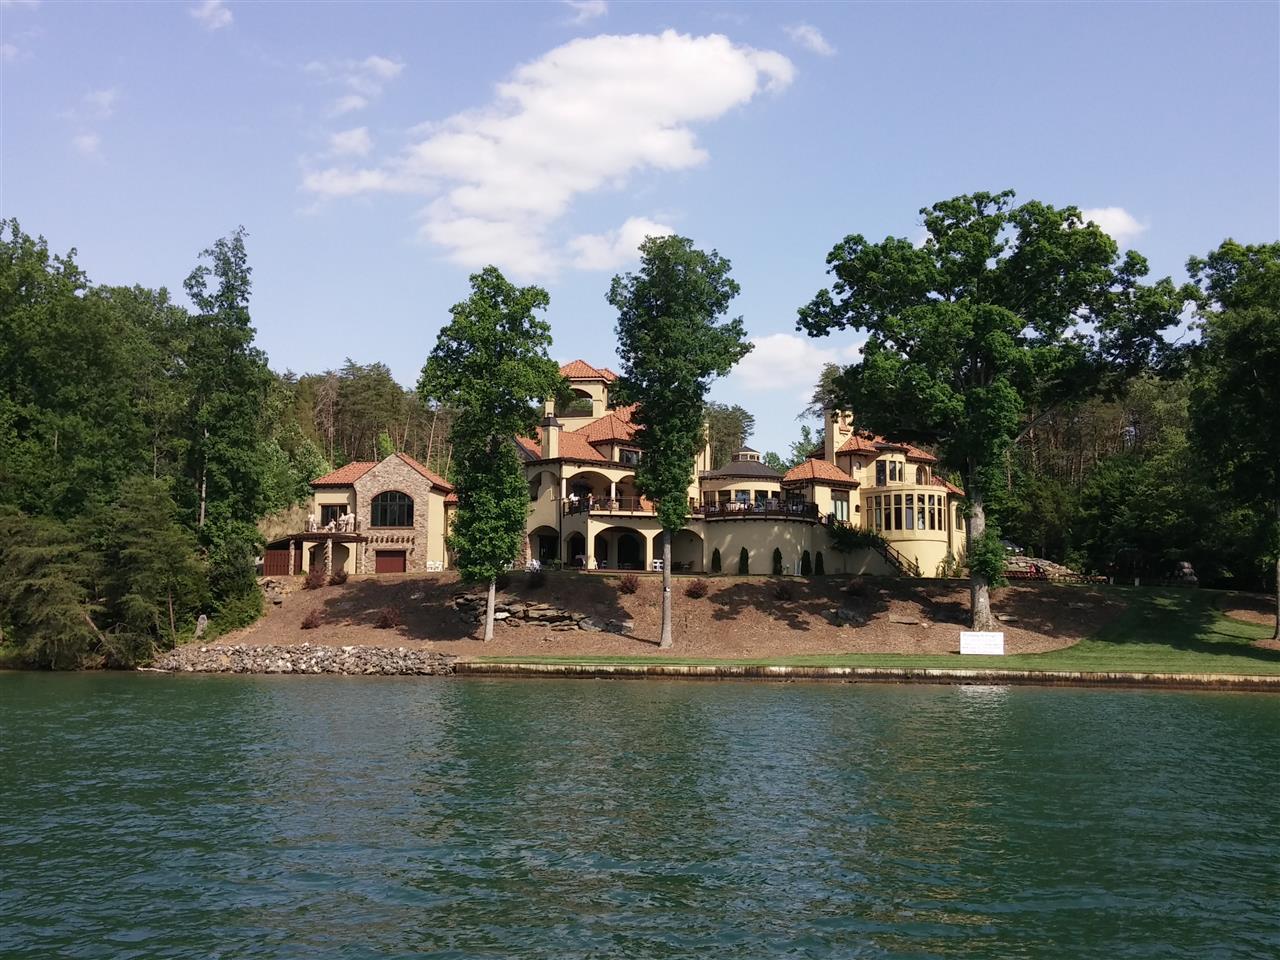 Bella Collina Mansion  a very popular wedding venue on Belews Lake located between Greensboro and Winston-Salem, NC.